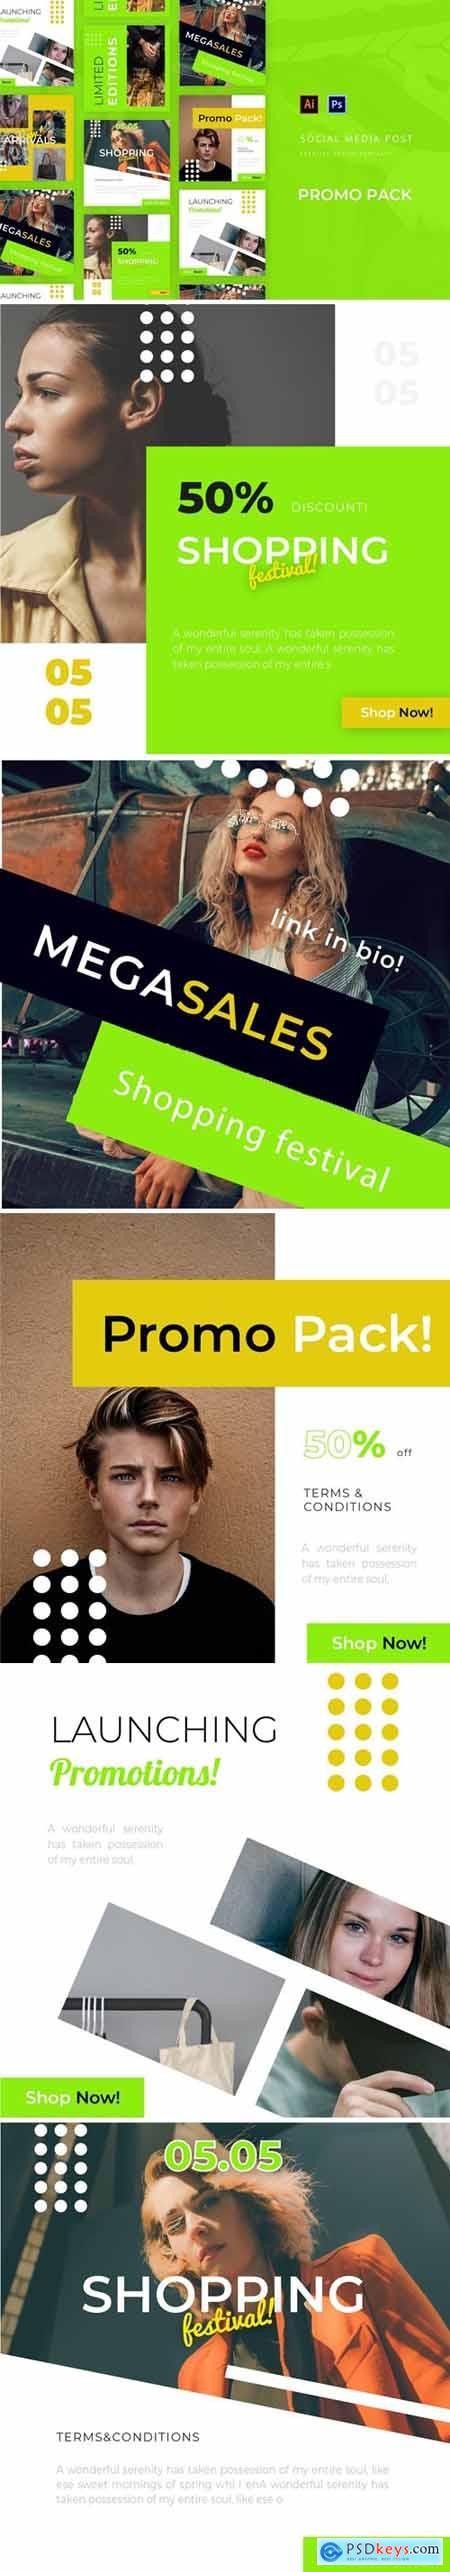 Promo Pack Social Media Post